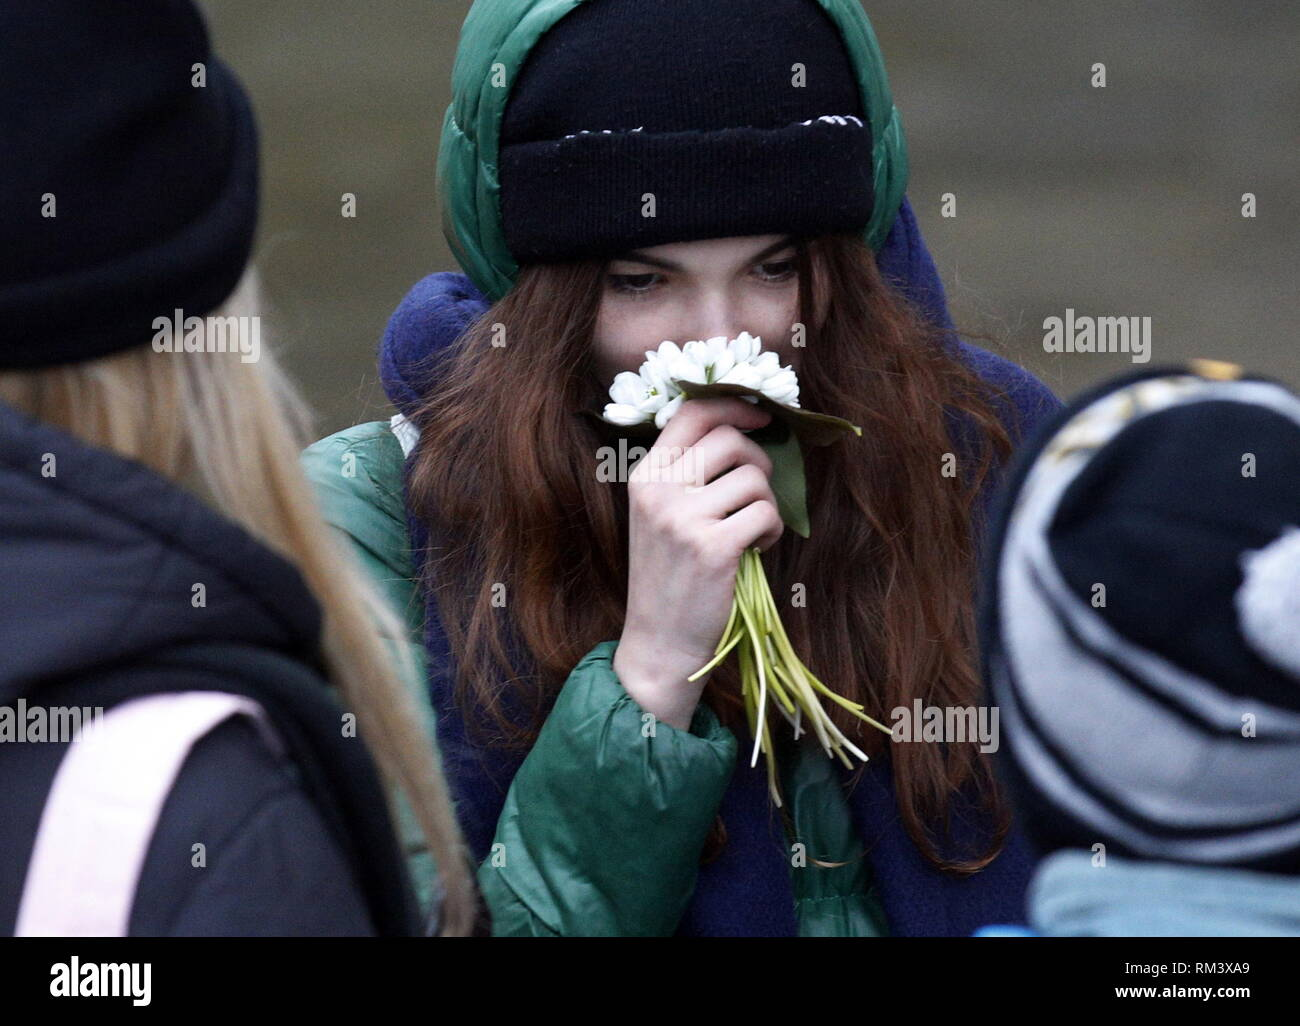 ROSTOV-ON-DON, RUSSIA - FEBRUARY 10, 2019: A girl smelling flowers. Valery Matytsin/TASS - Stock Image